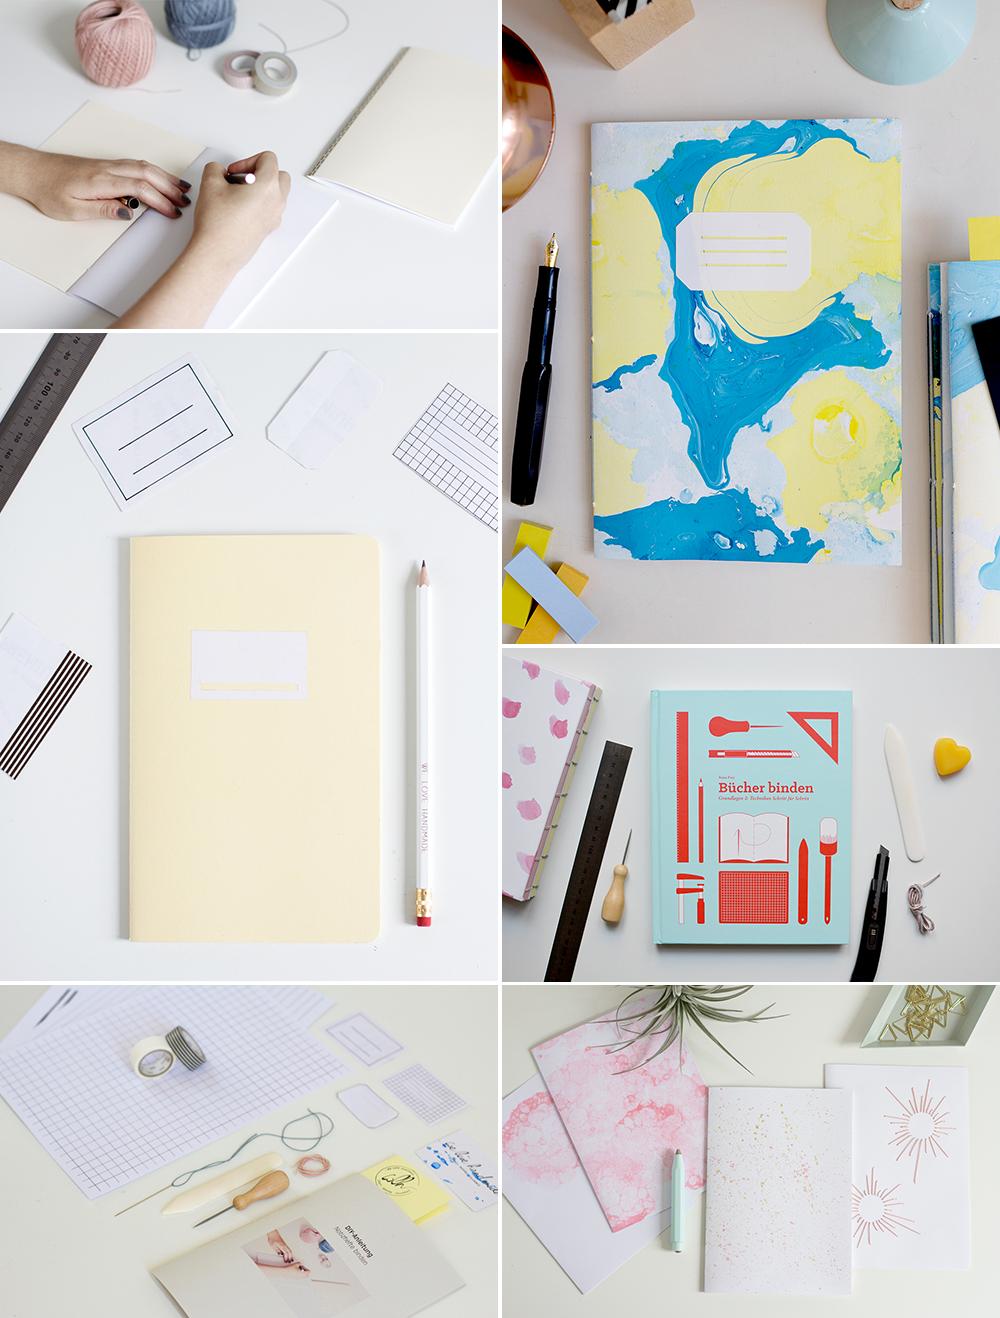 DIY-Inspiration: Buchbinden | we love handmade